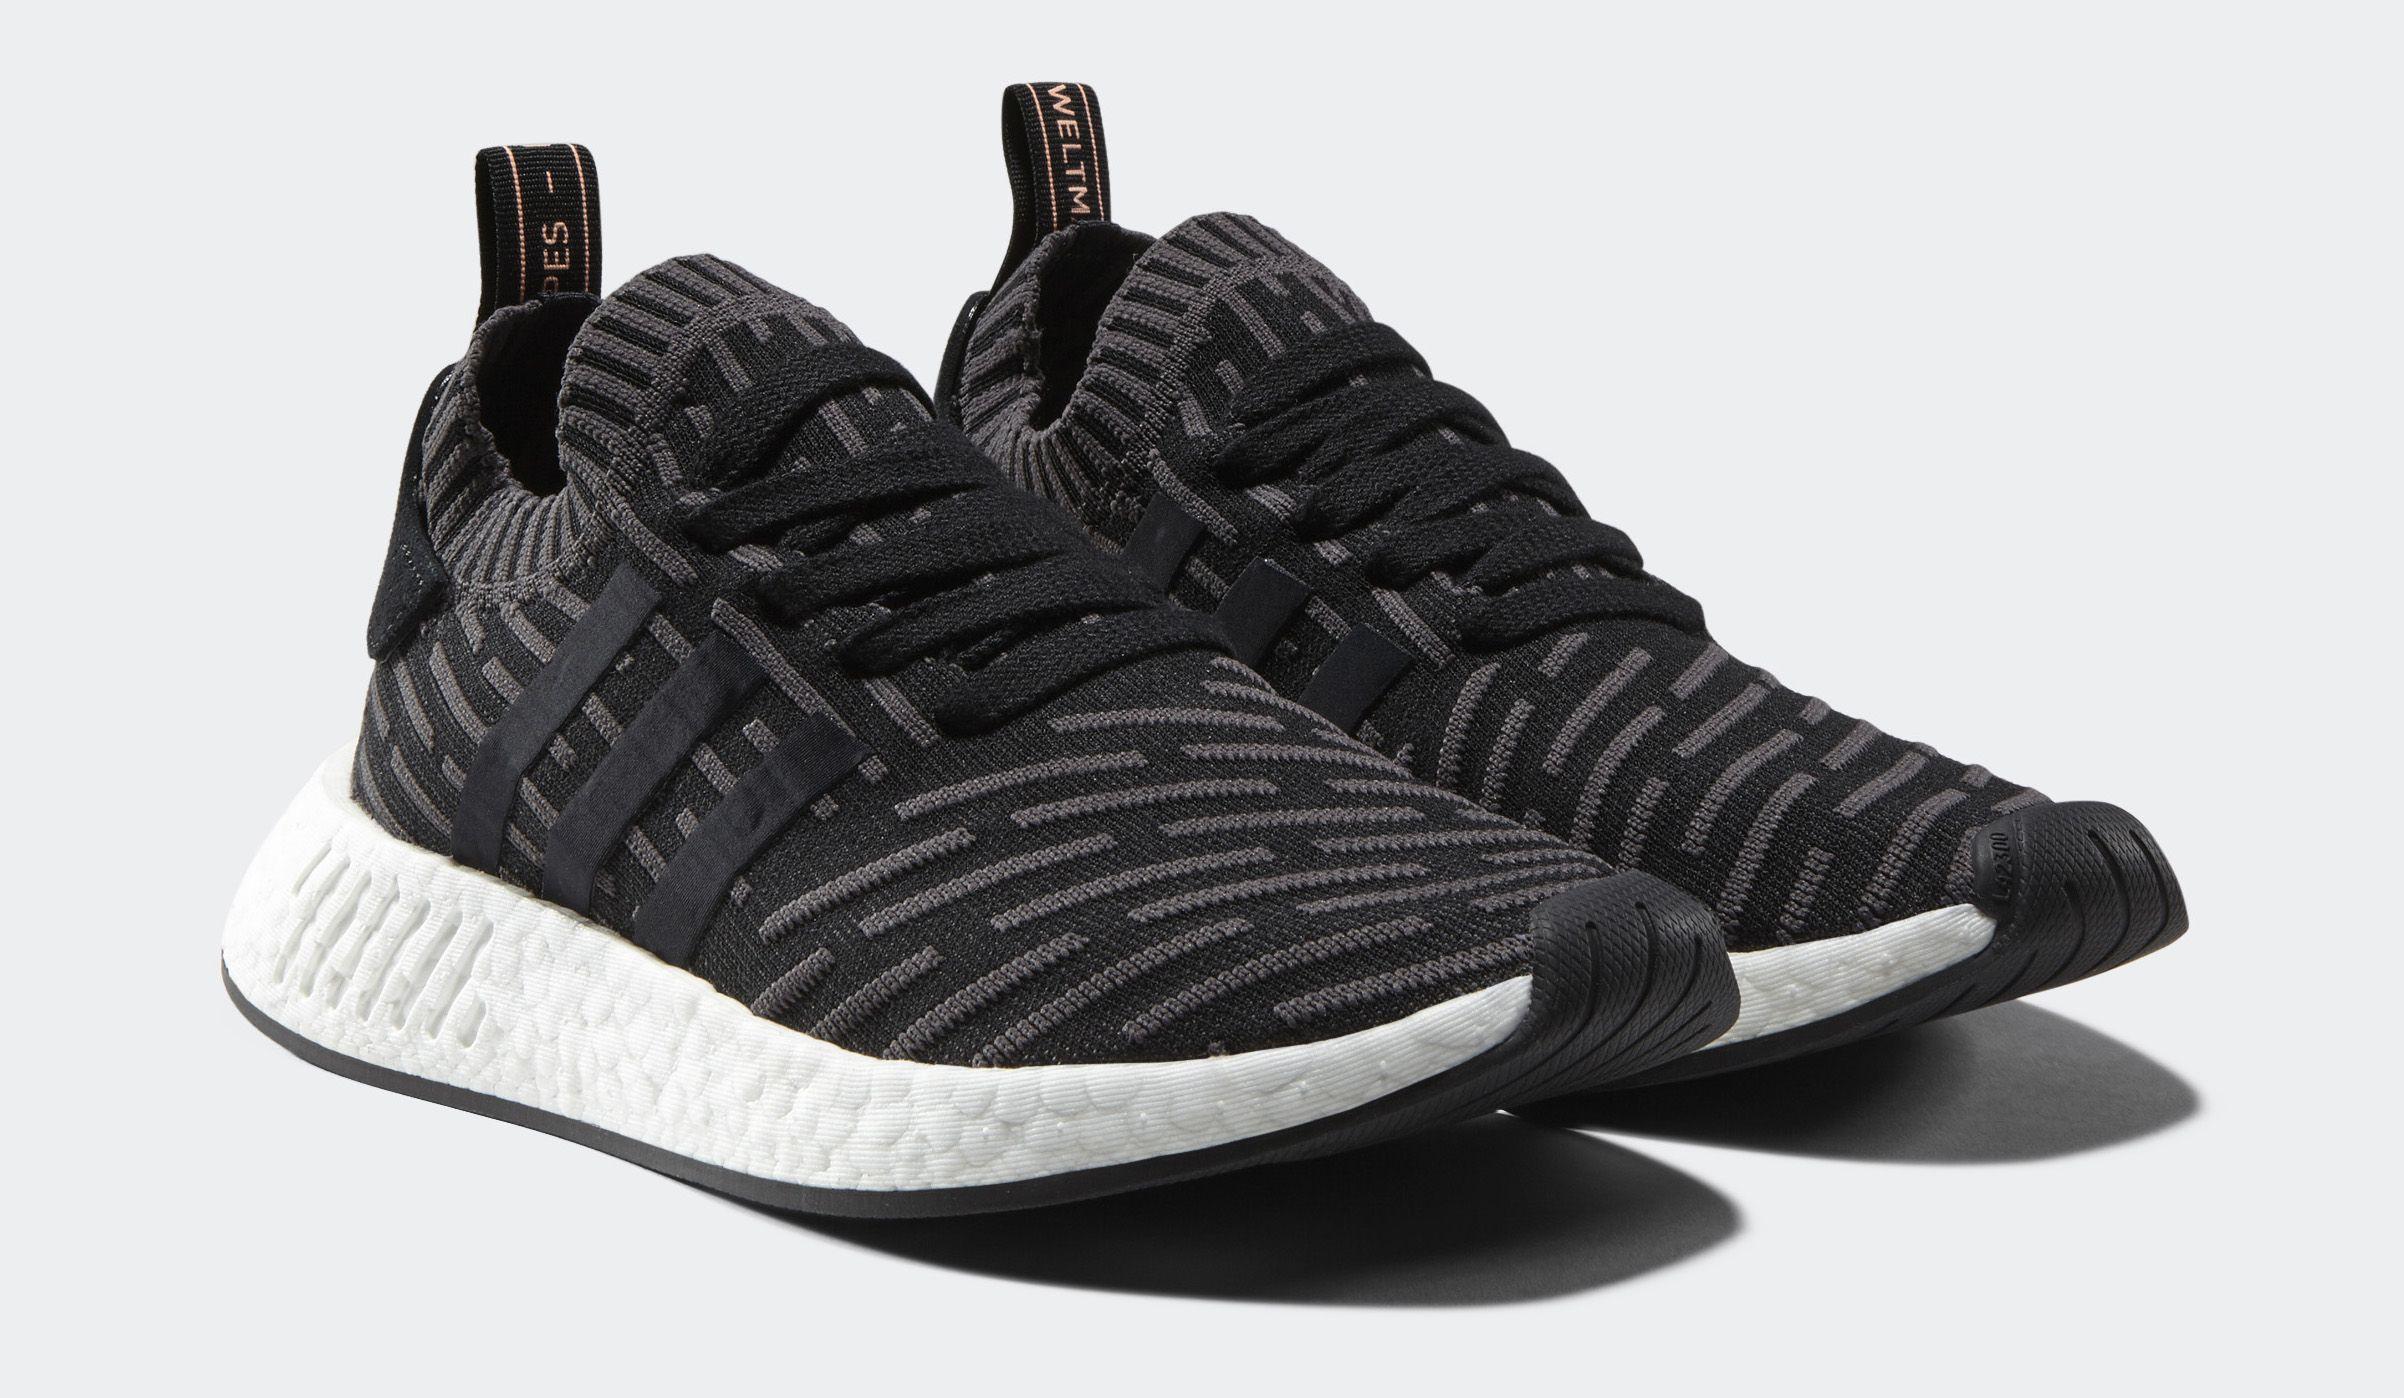 adidas shoes nmd r2 mens primeknit core black the new adidas shoes that look like roshi runs